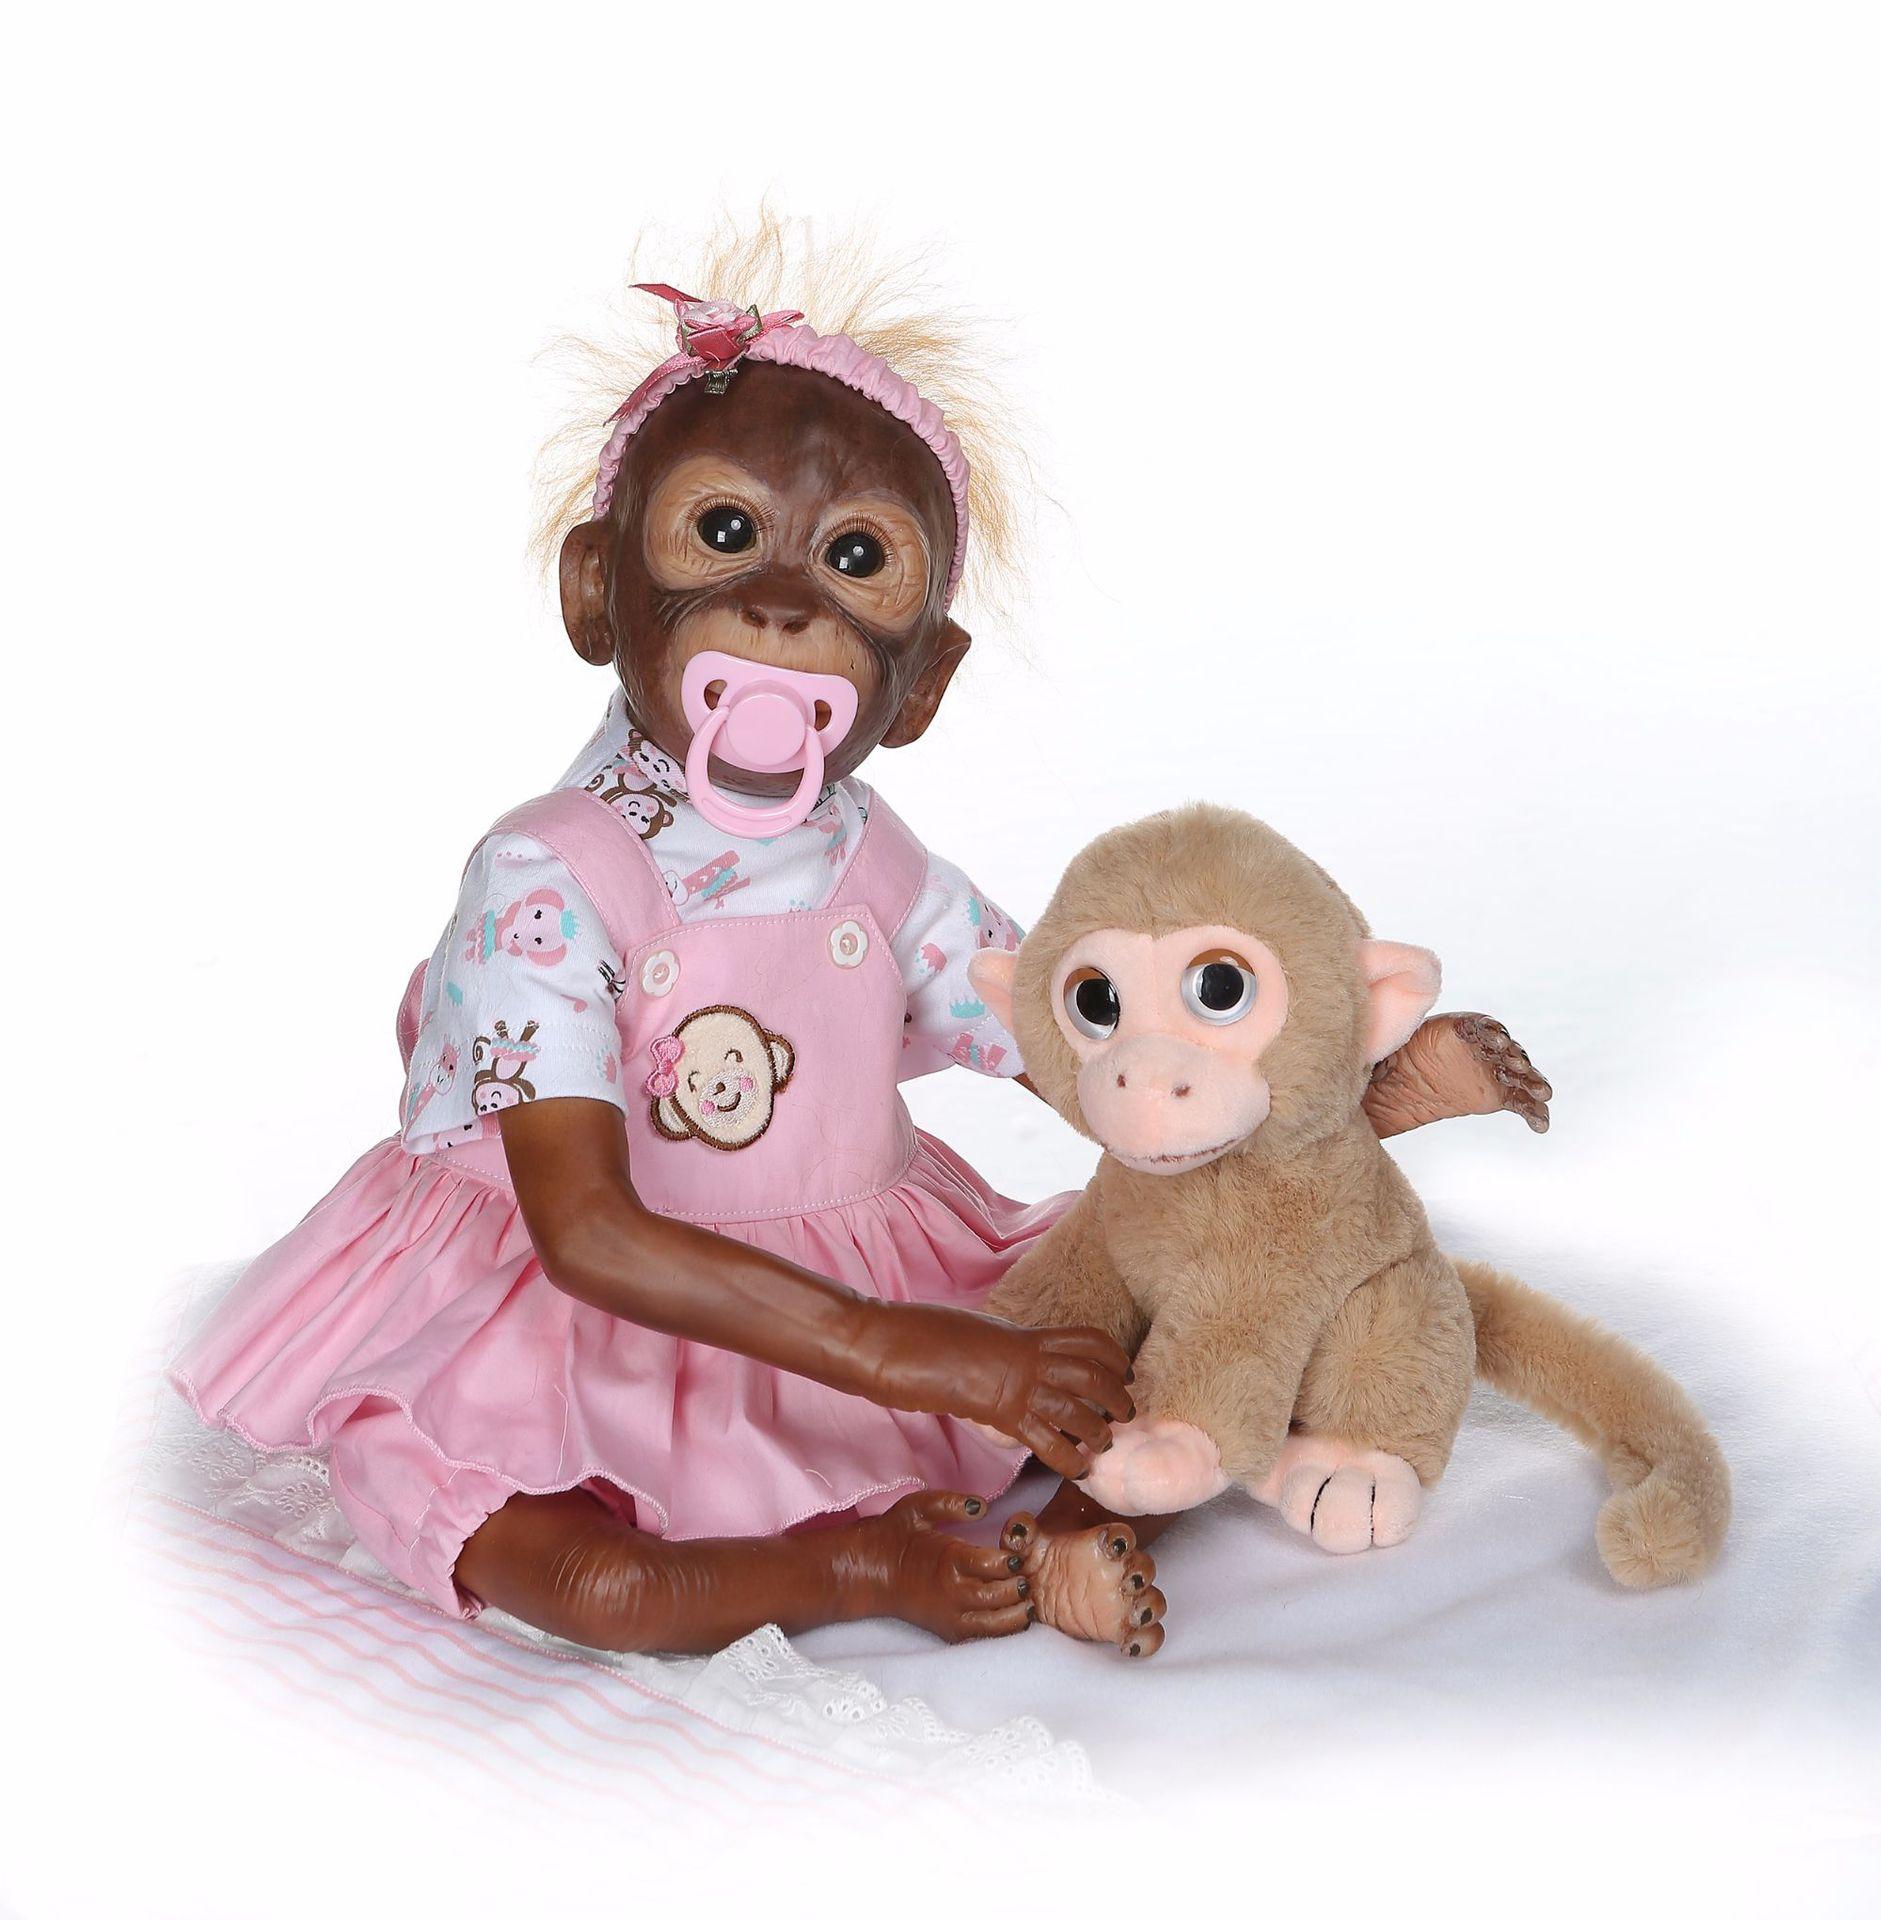 NPK New Style Cute Twins Monkey Doll Send Children Creative Gifts